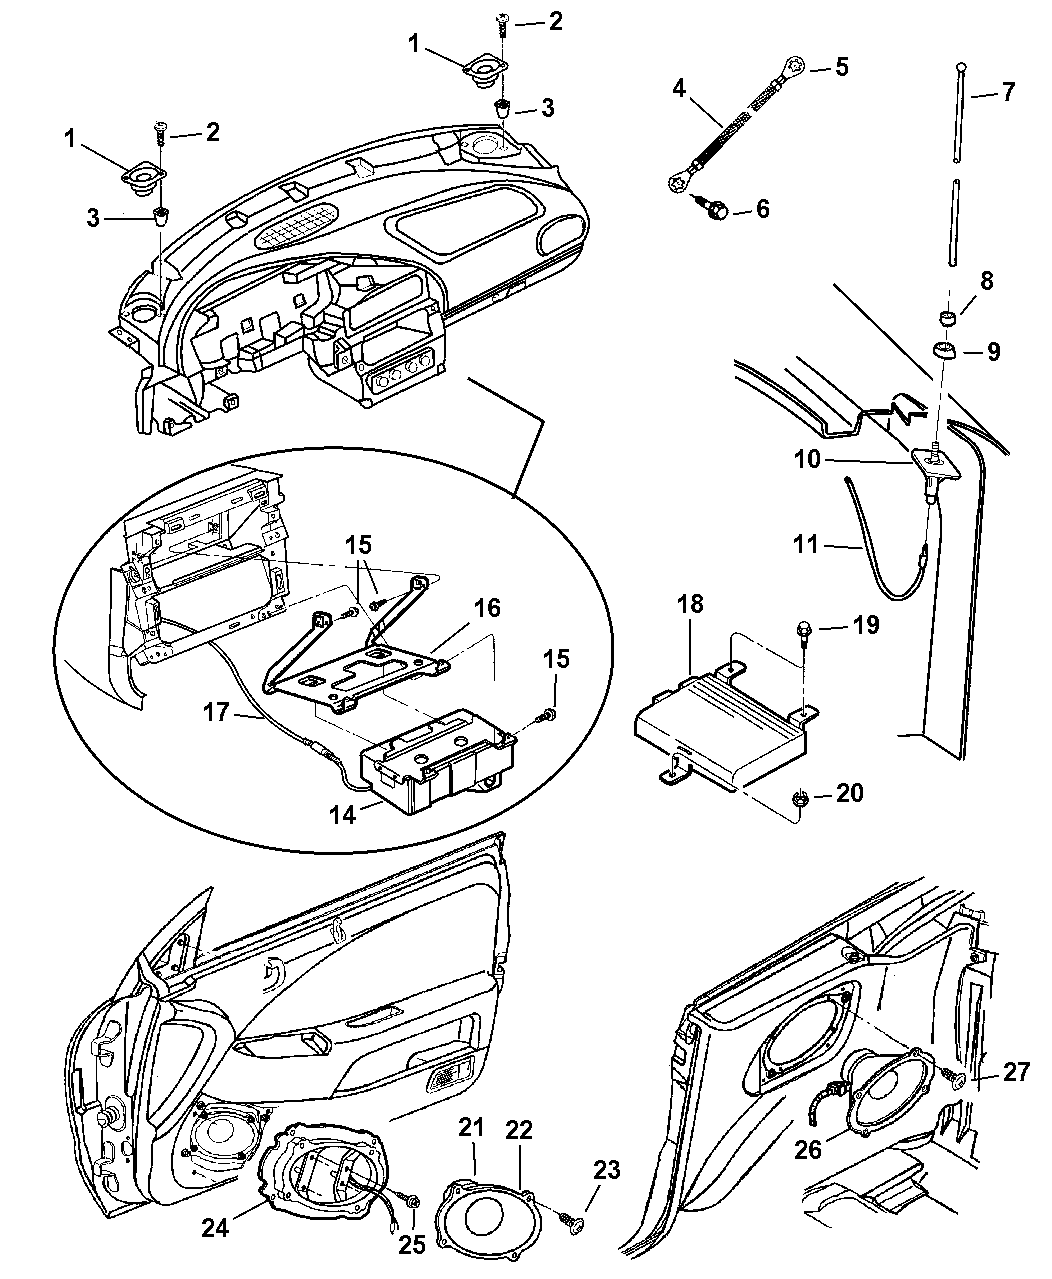 2000 Chrysler Sebring Convertible Speakers Antenna Amplifier And Engine Diagram Cd Changer